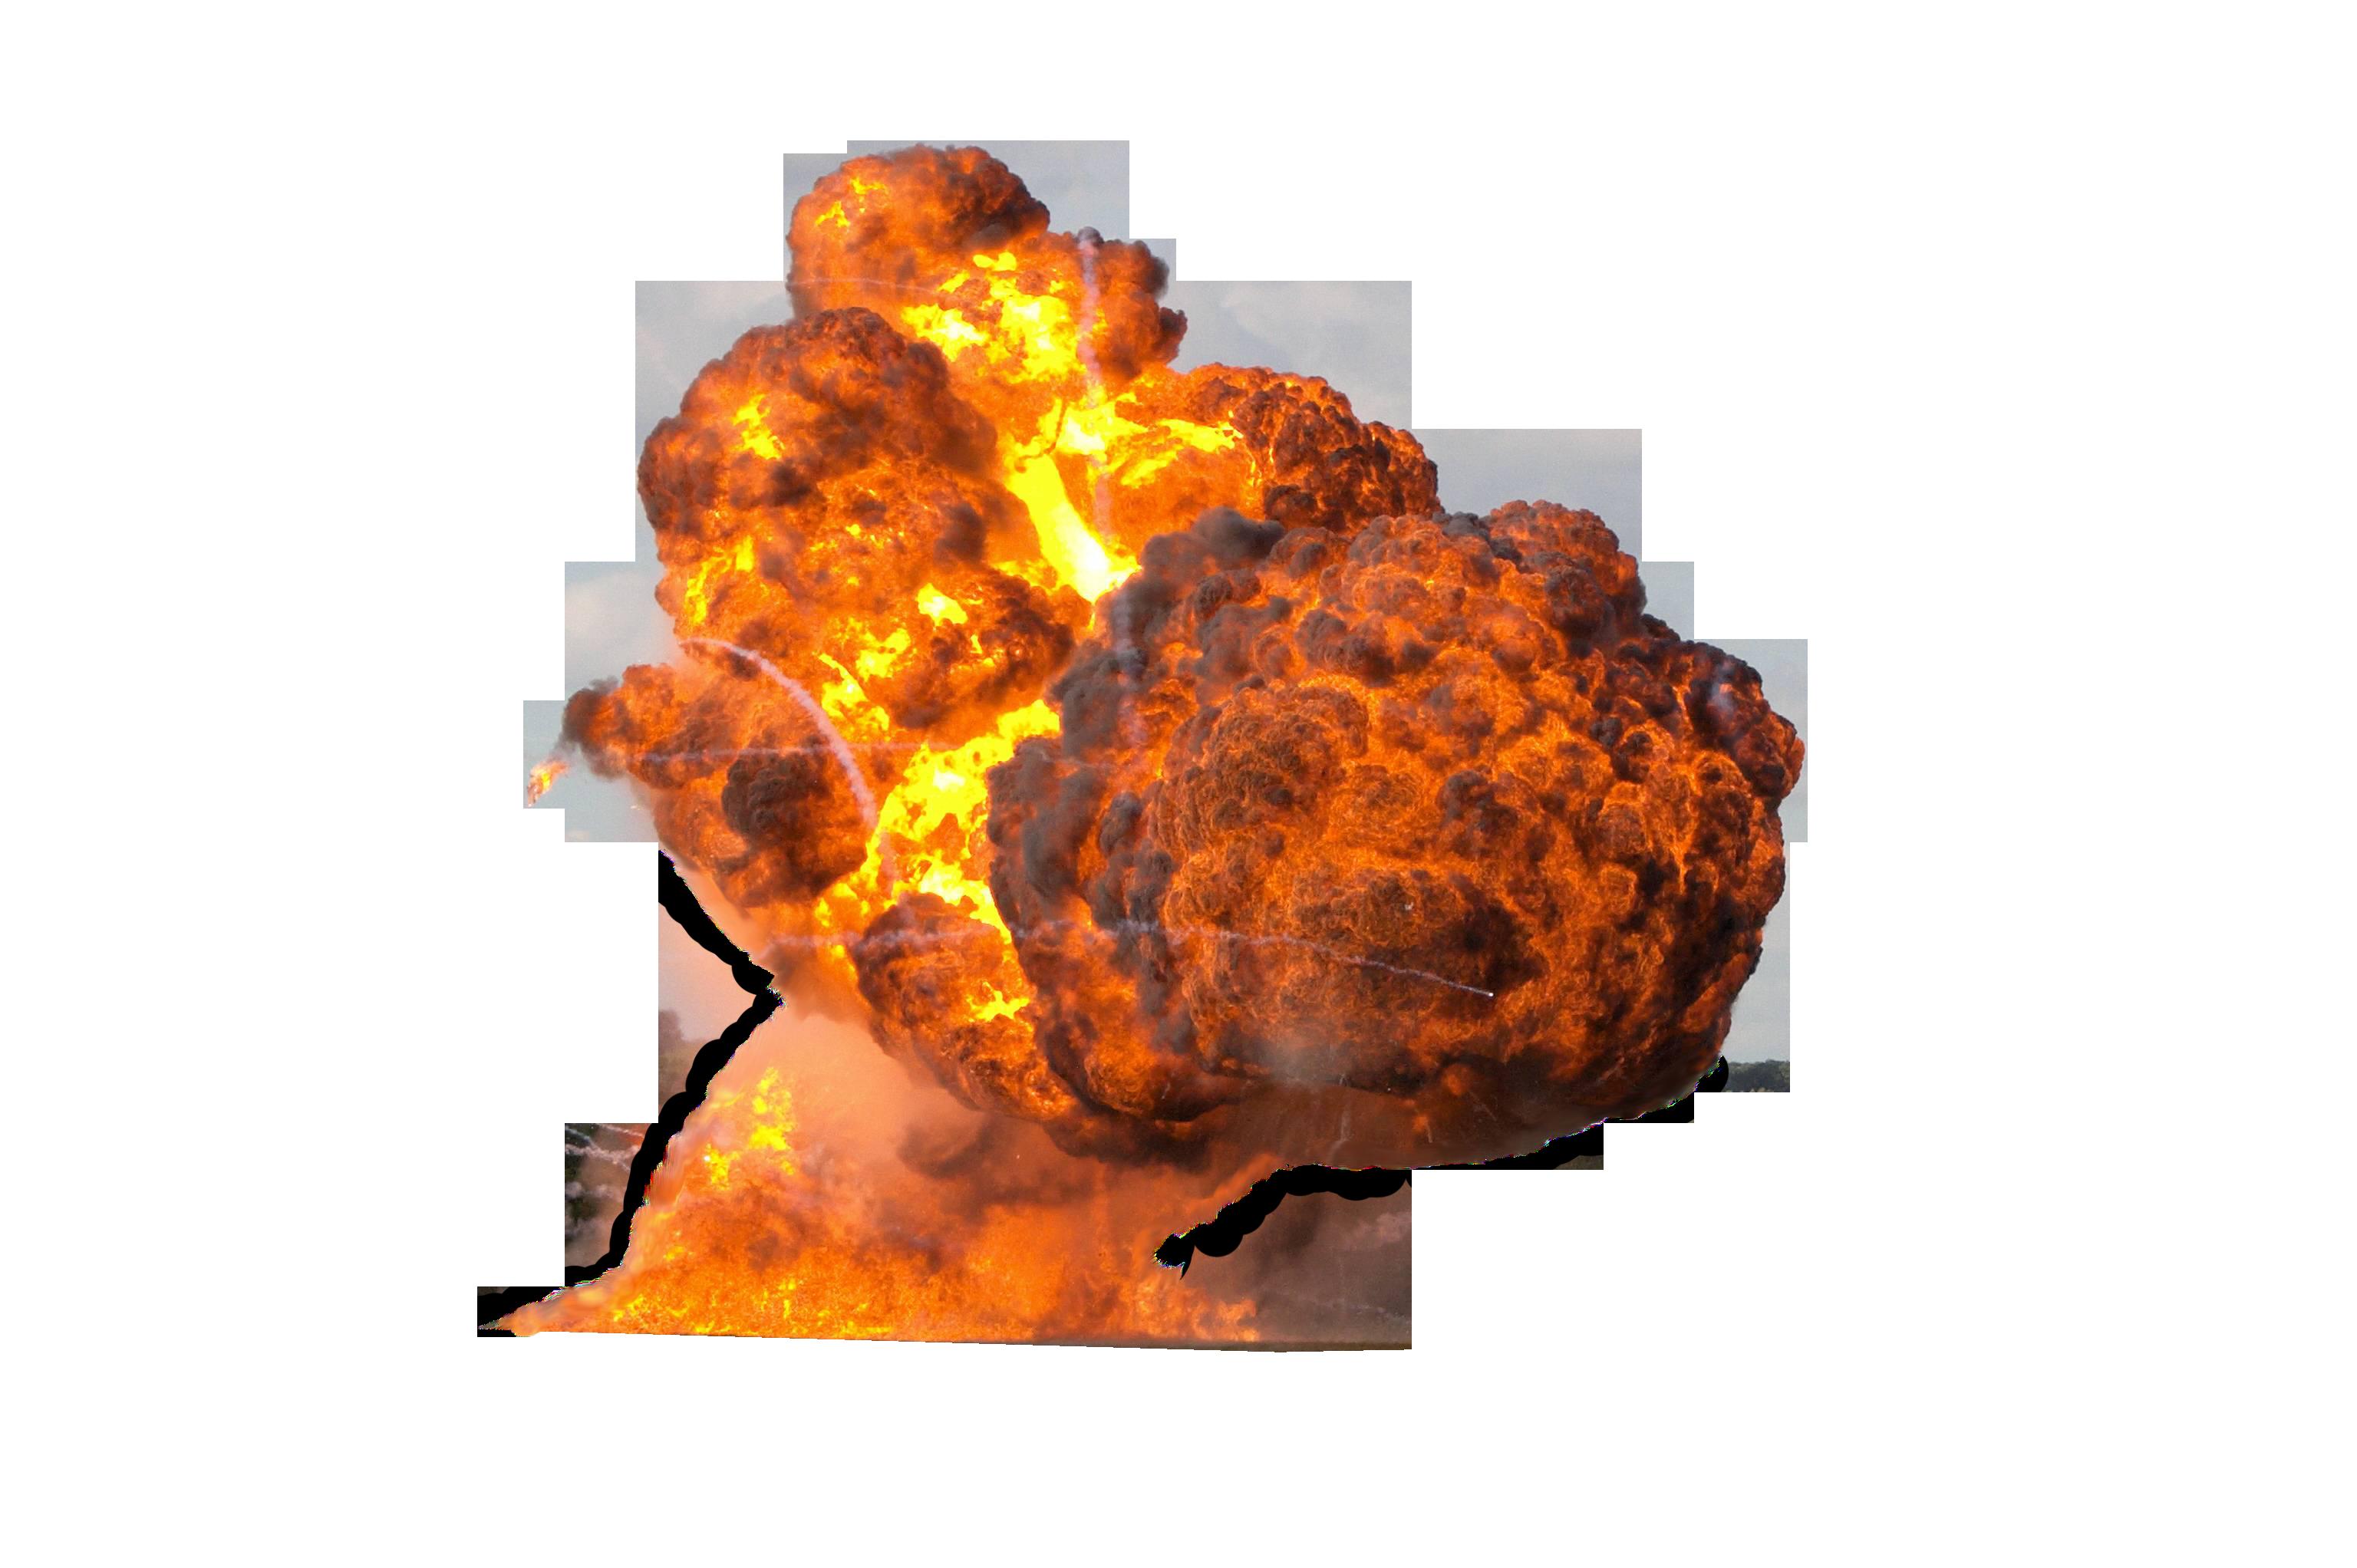 Big Explosion PNG PNG Image - PurePNG